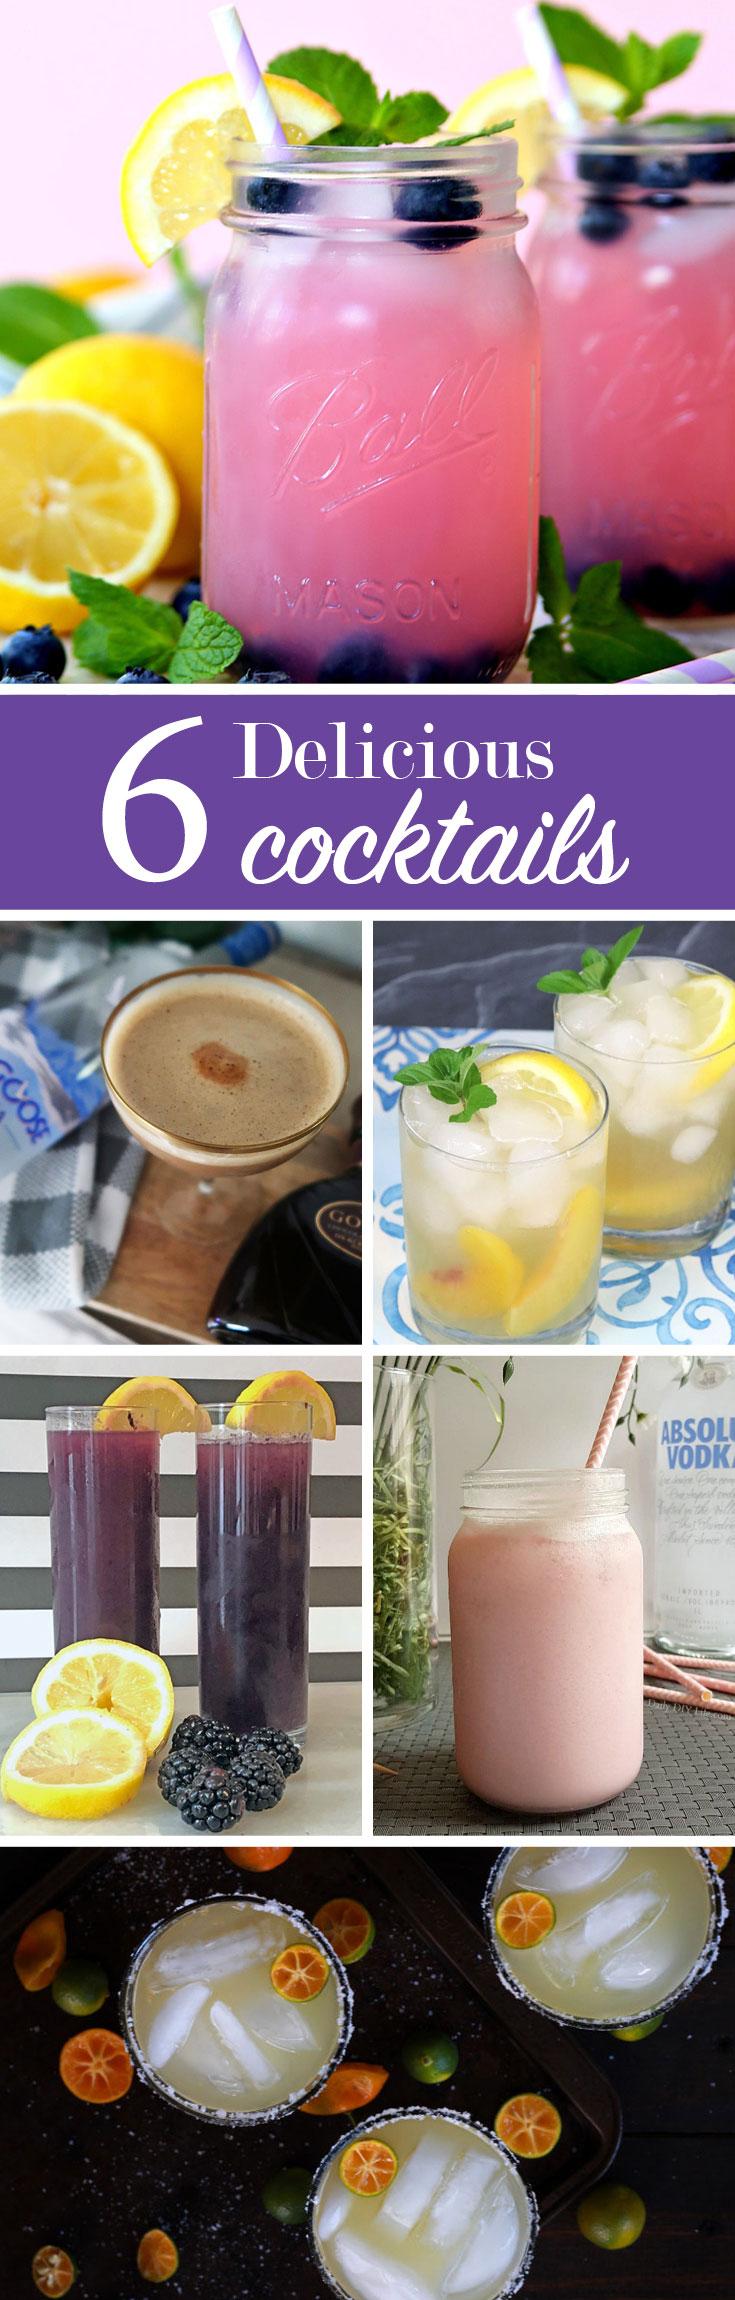 6 Delicious Cocktails